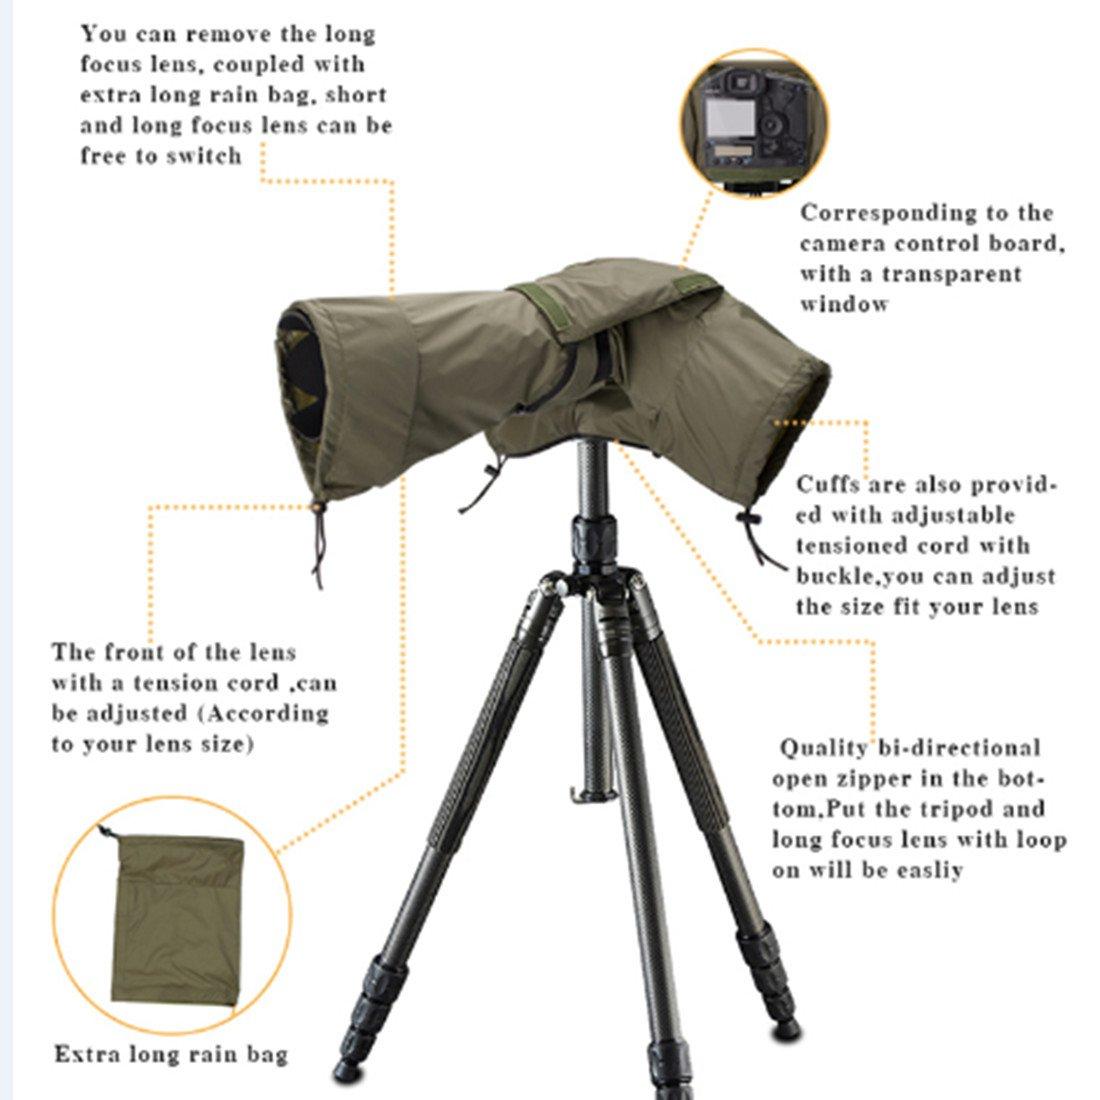 Safrotto Camera Rain Cover for DSLR/SLR Cameras Protector Canon Nikon  Olympus,Pentax,Fuji Sony,Tamrox,Sigma Black-S